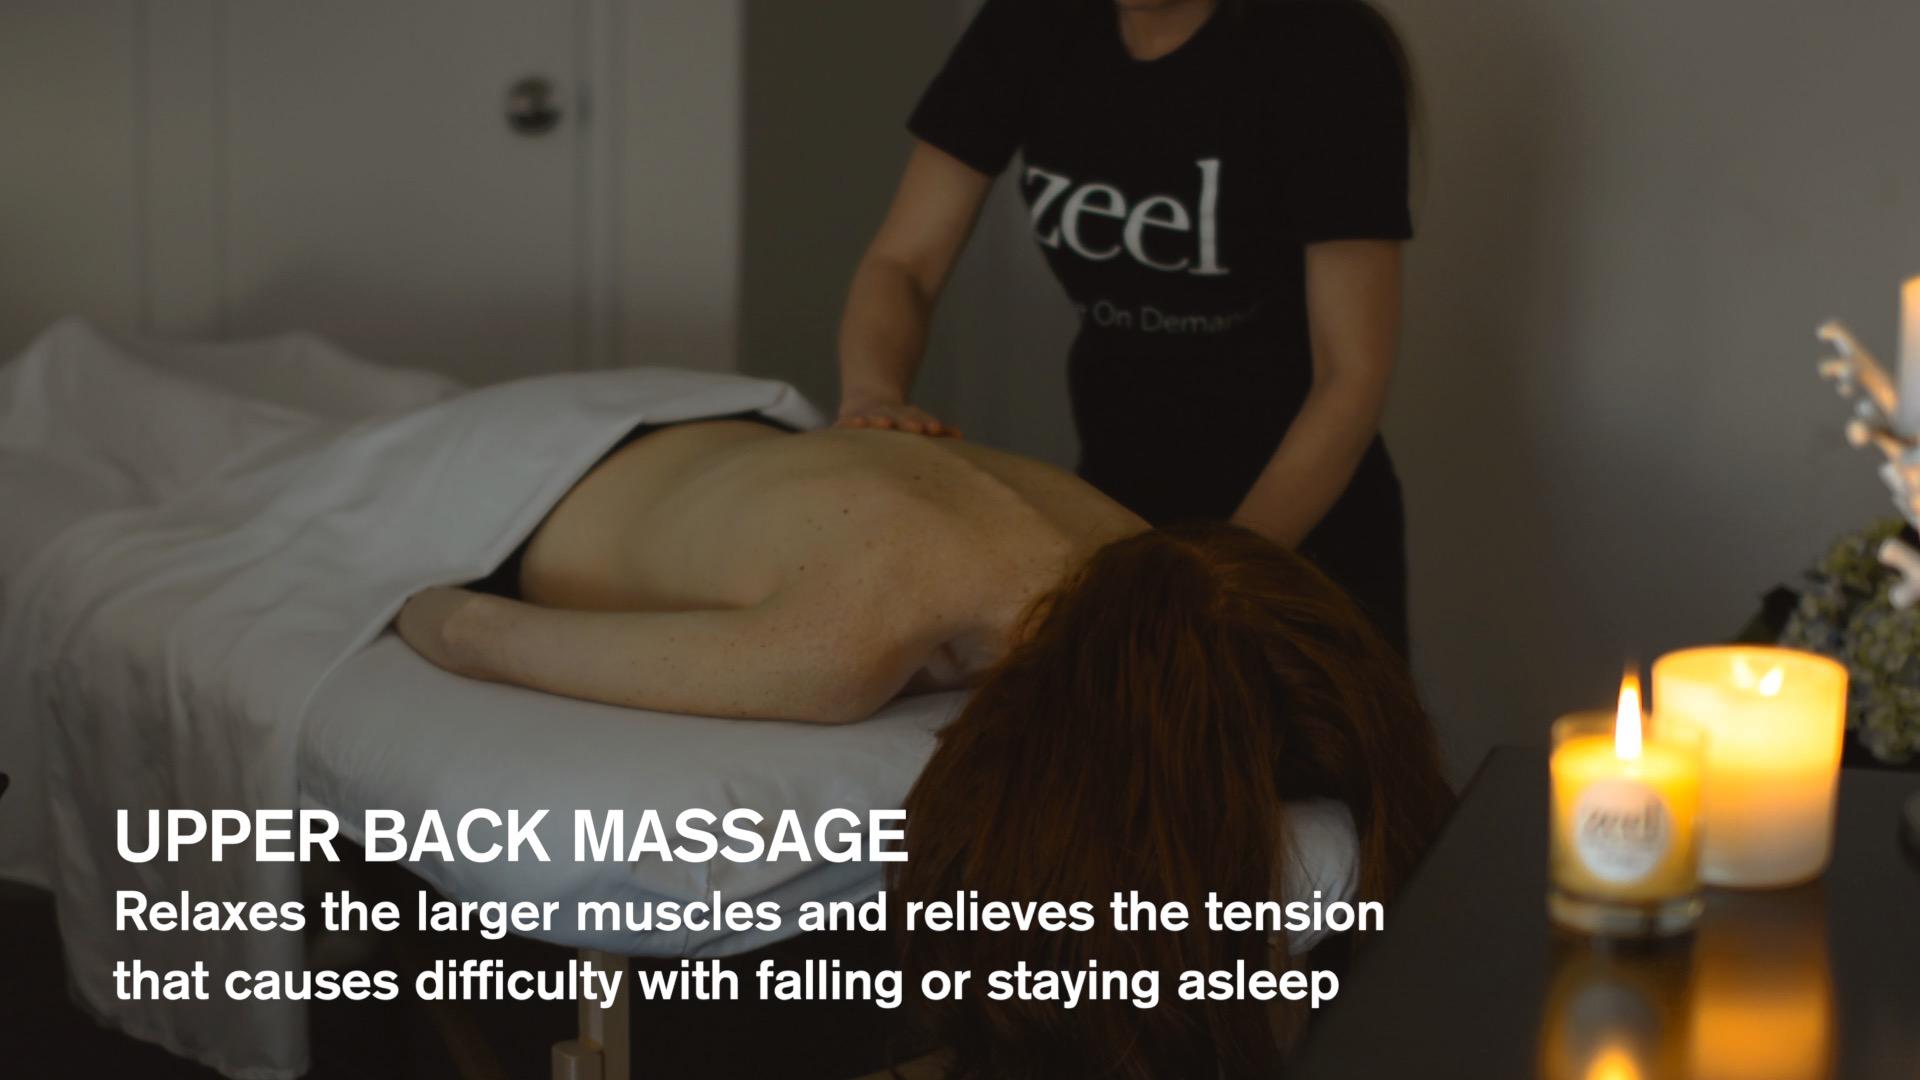 Treating Sleep Apnea with Massage: Everything You Need to